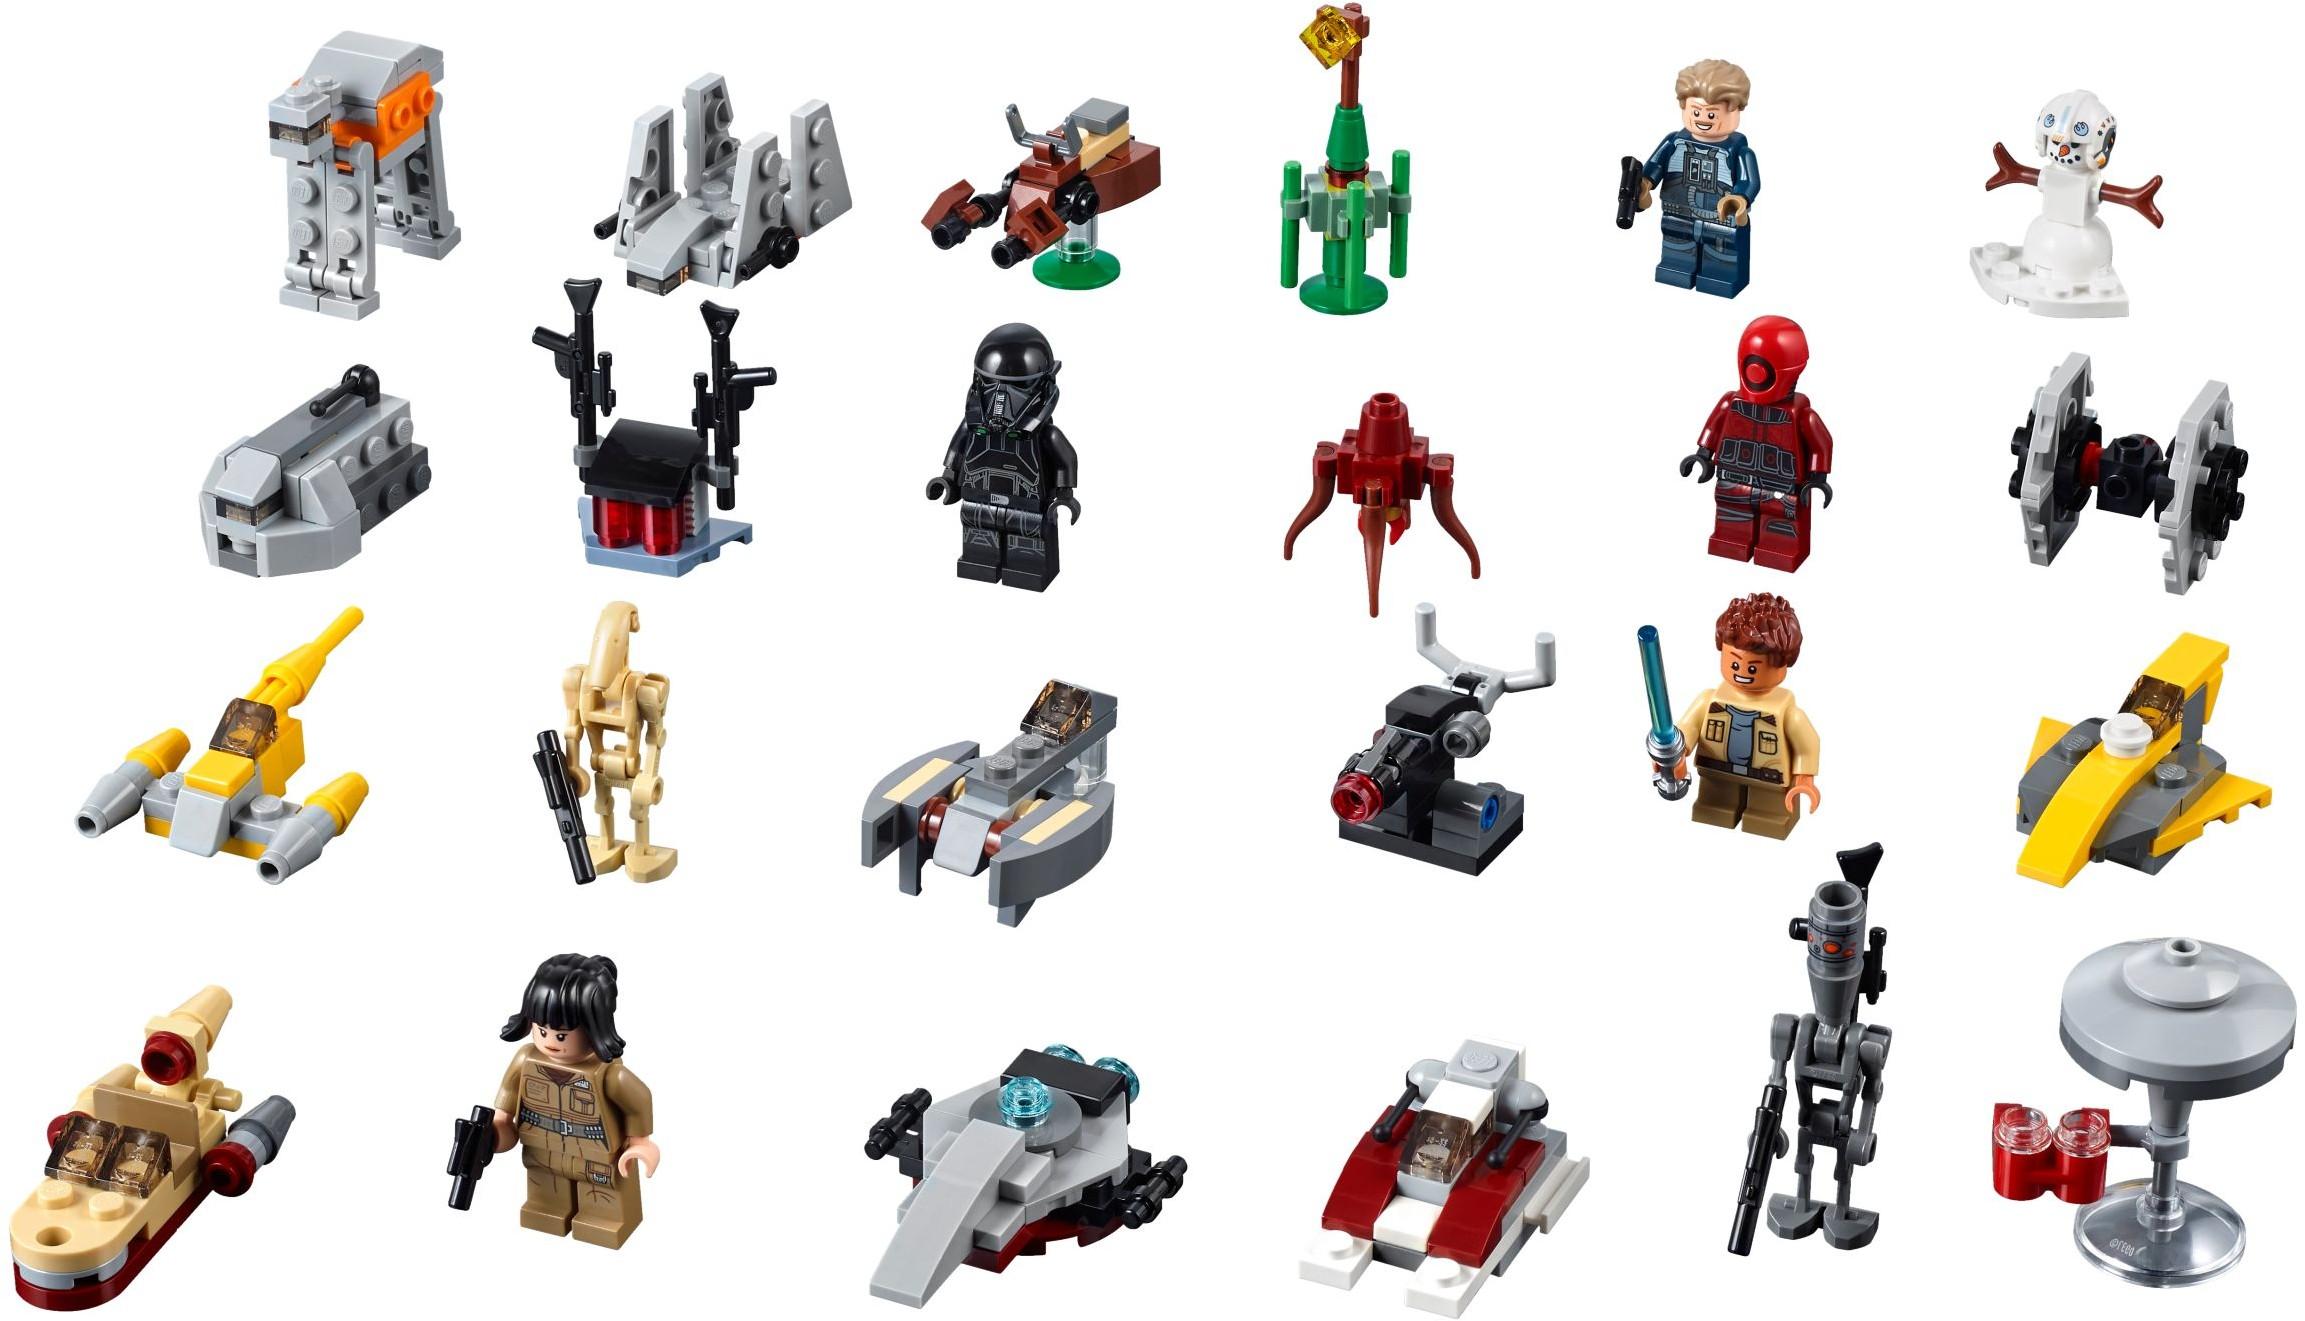 2018 LEGO Advent Calendars Now Available at shop.LEGO.com